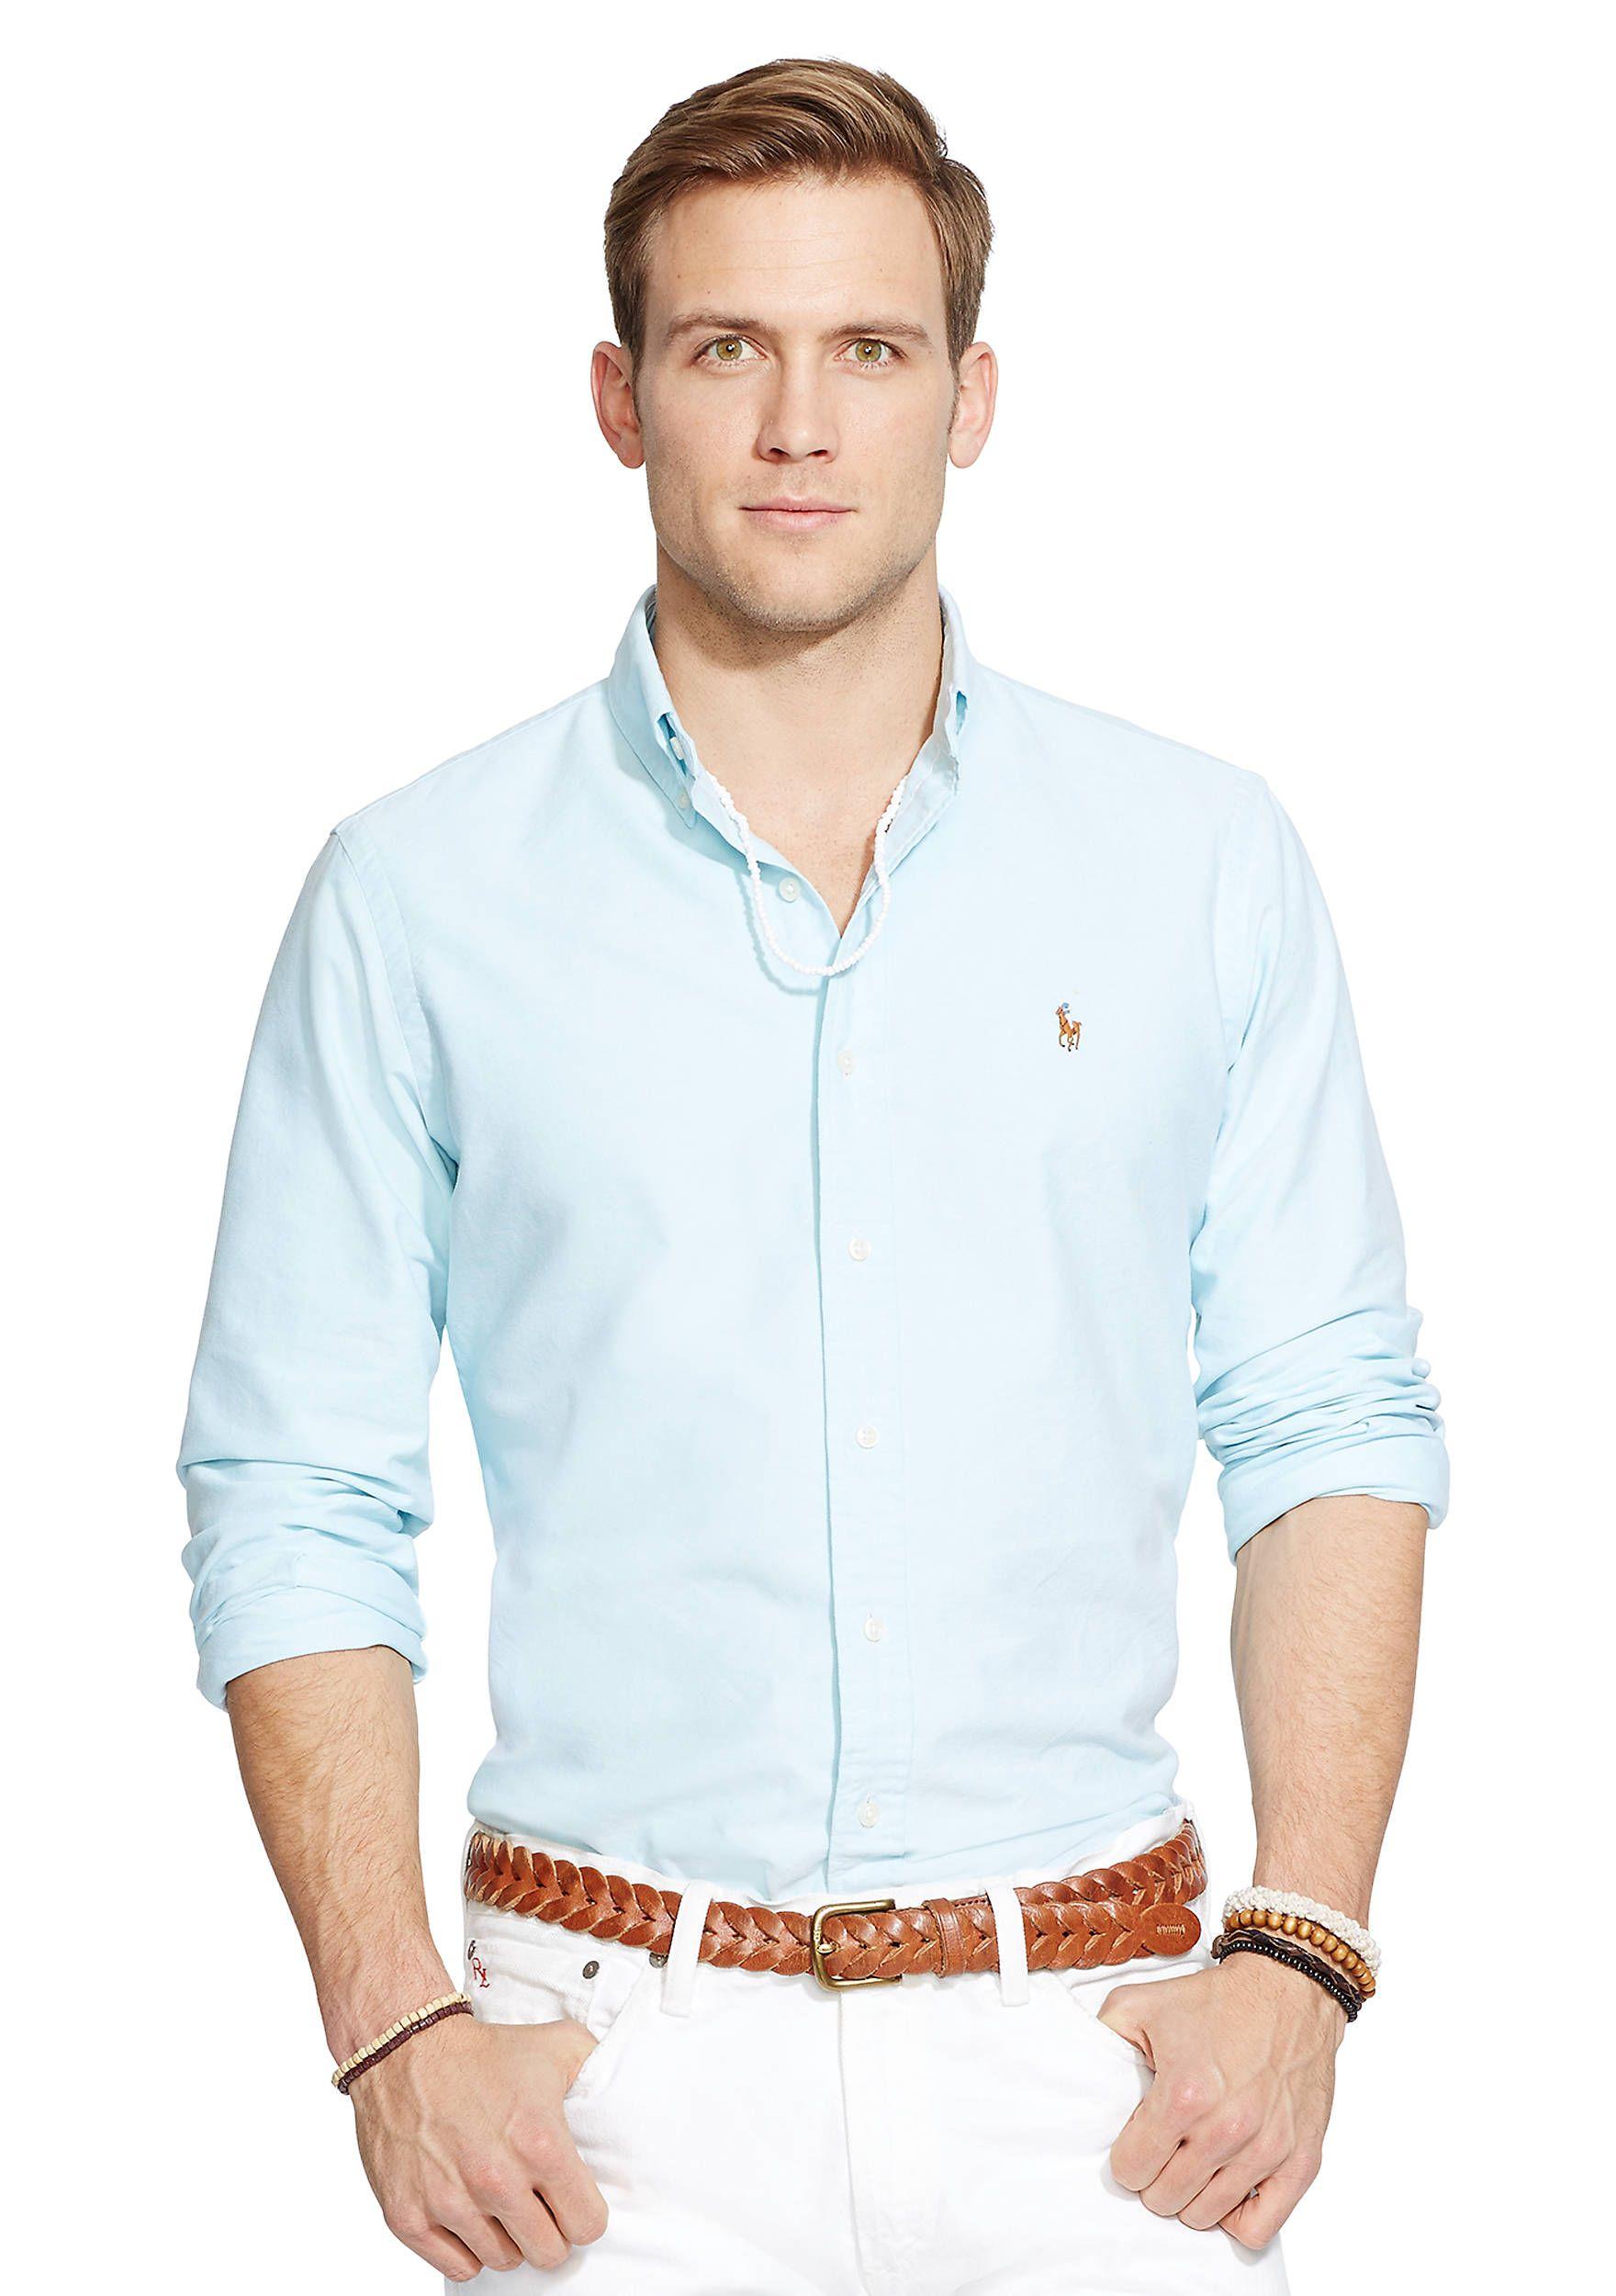 Polo Ralph Lauren Oxford Shirt Blue Men Shirts Casual Clearance Sale